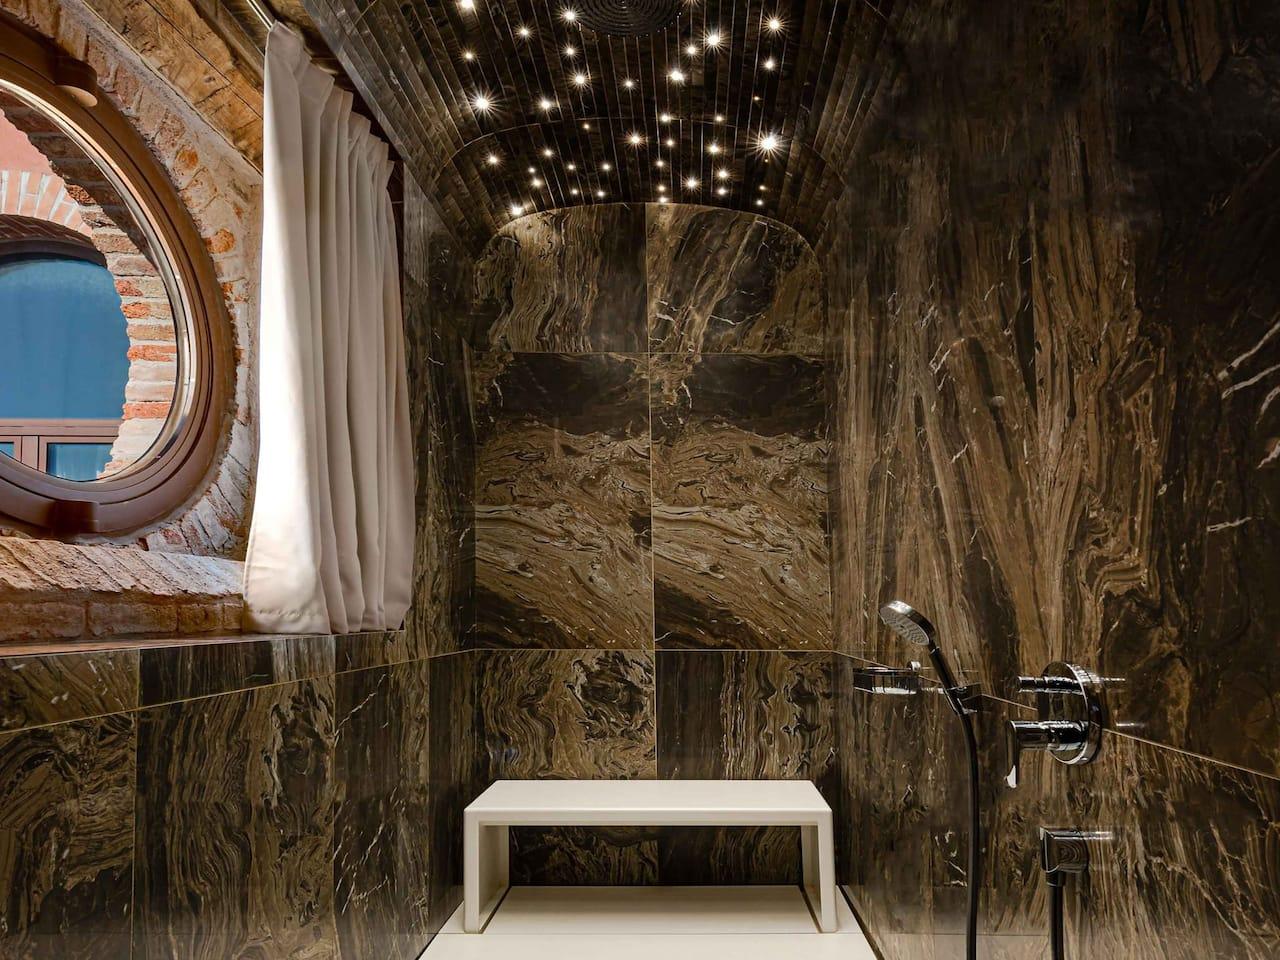 Hyatt Centric Murano bathroom